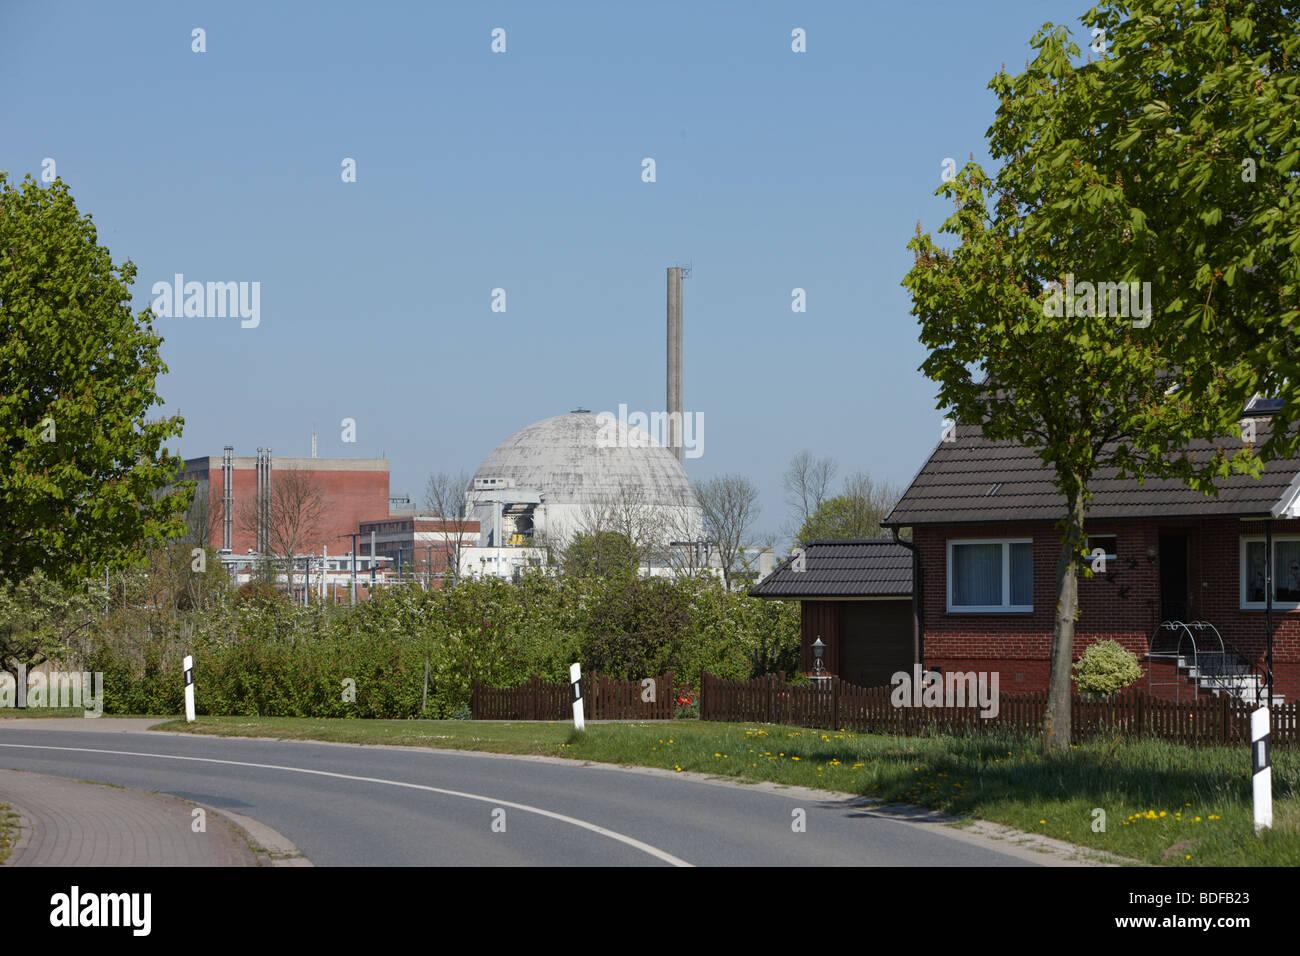 Nuclear Power Plant, Atomkraftwerk, Stade, Germany - Stock Image